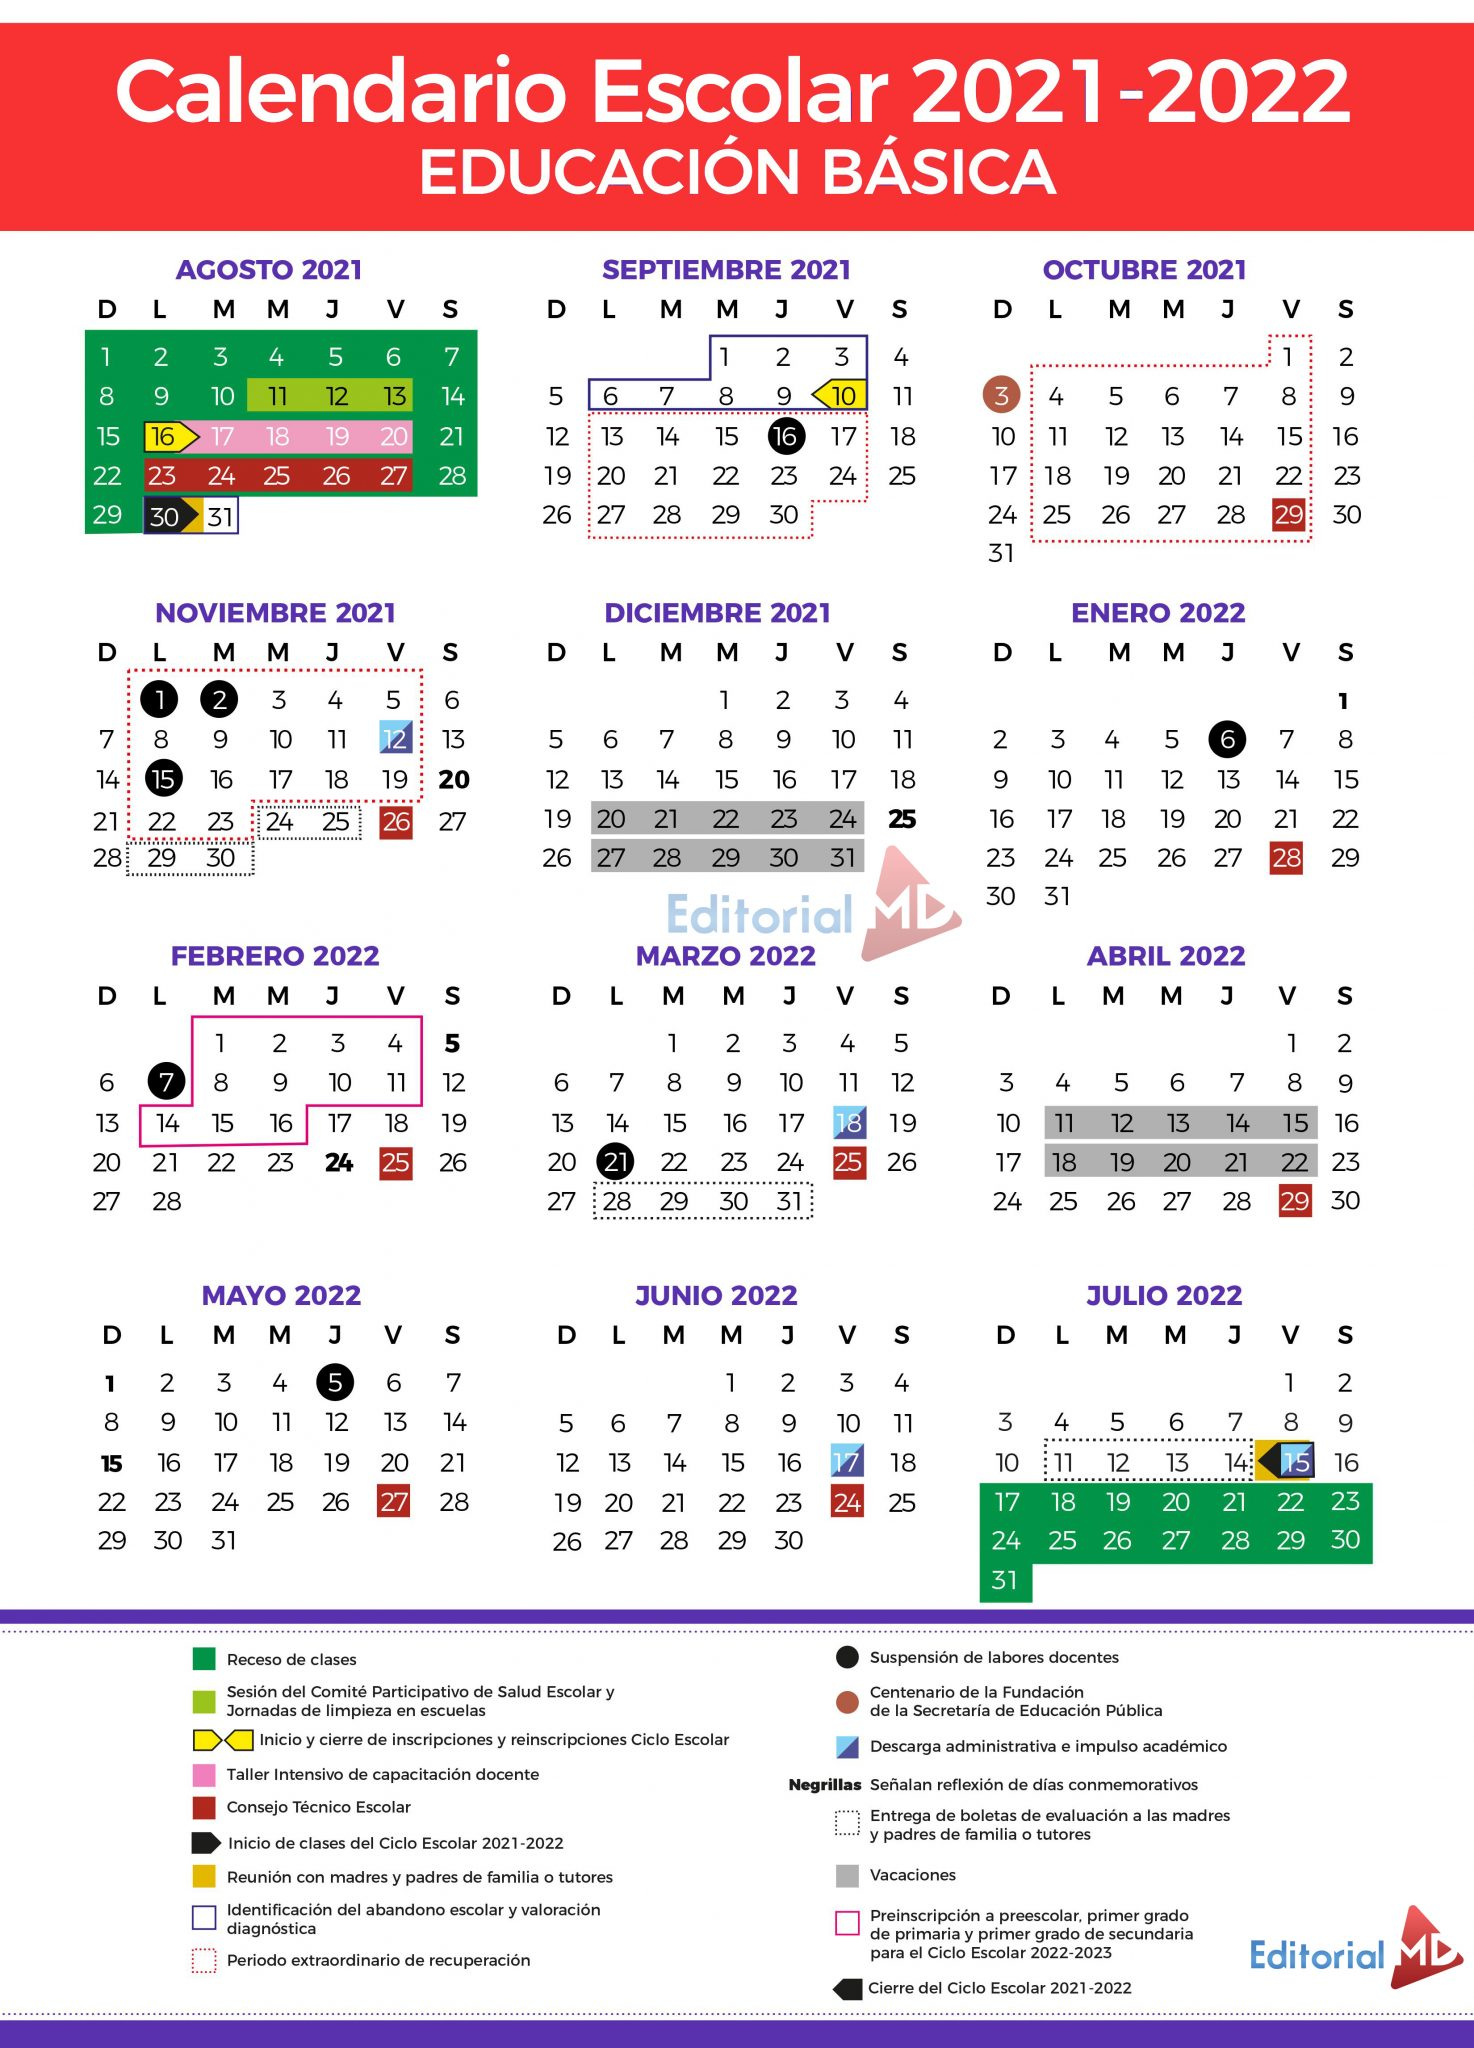 Calendario Escolar 2021-2022 de la SEP (200 días)MD